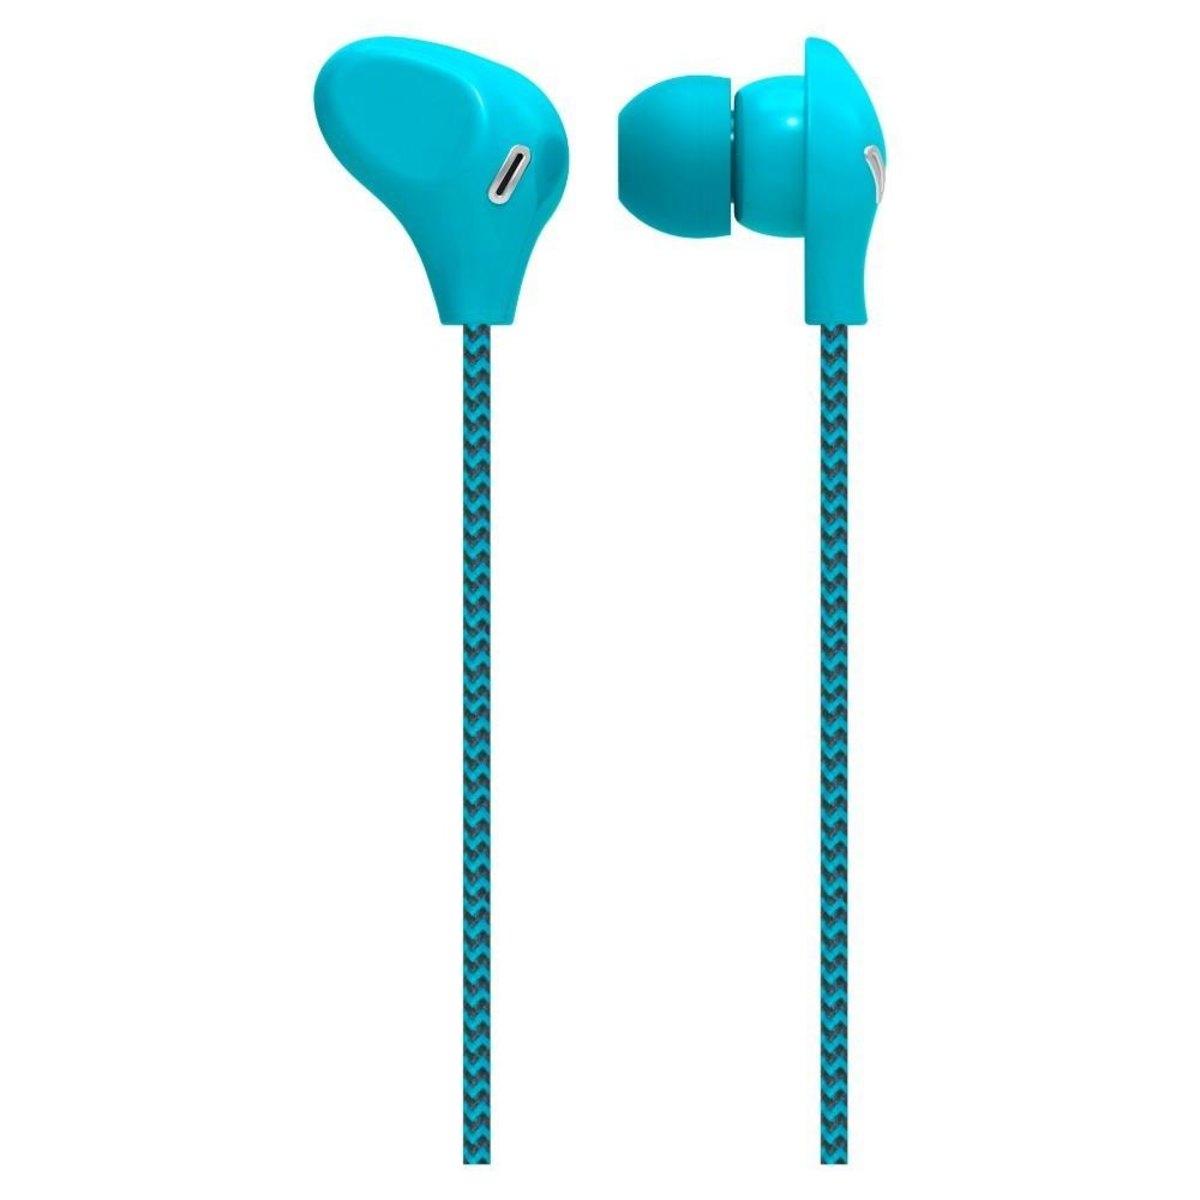 Fone de Ouvido Intra-auricular Com Microfone Azul Multilaser Ph195